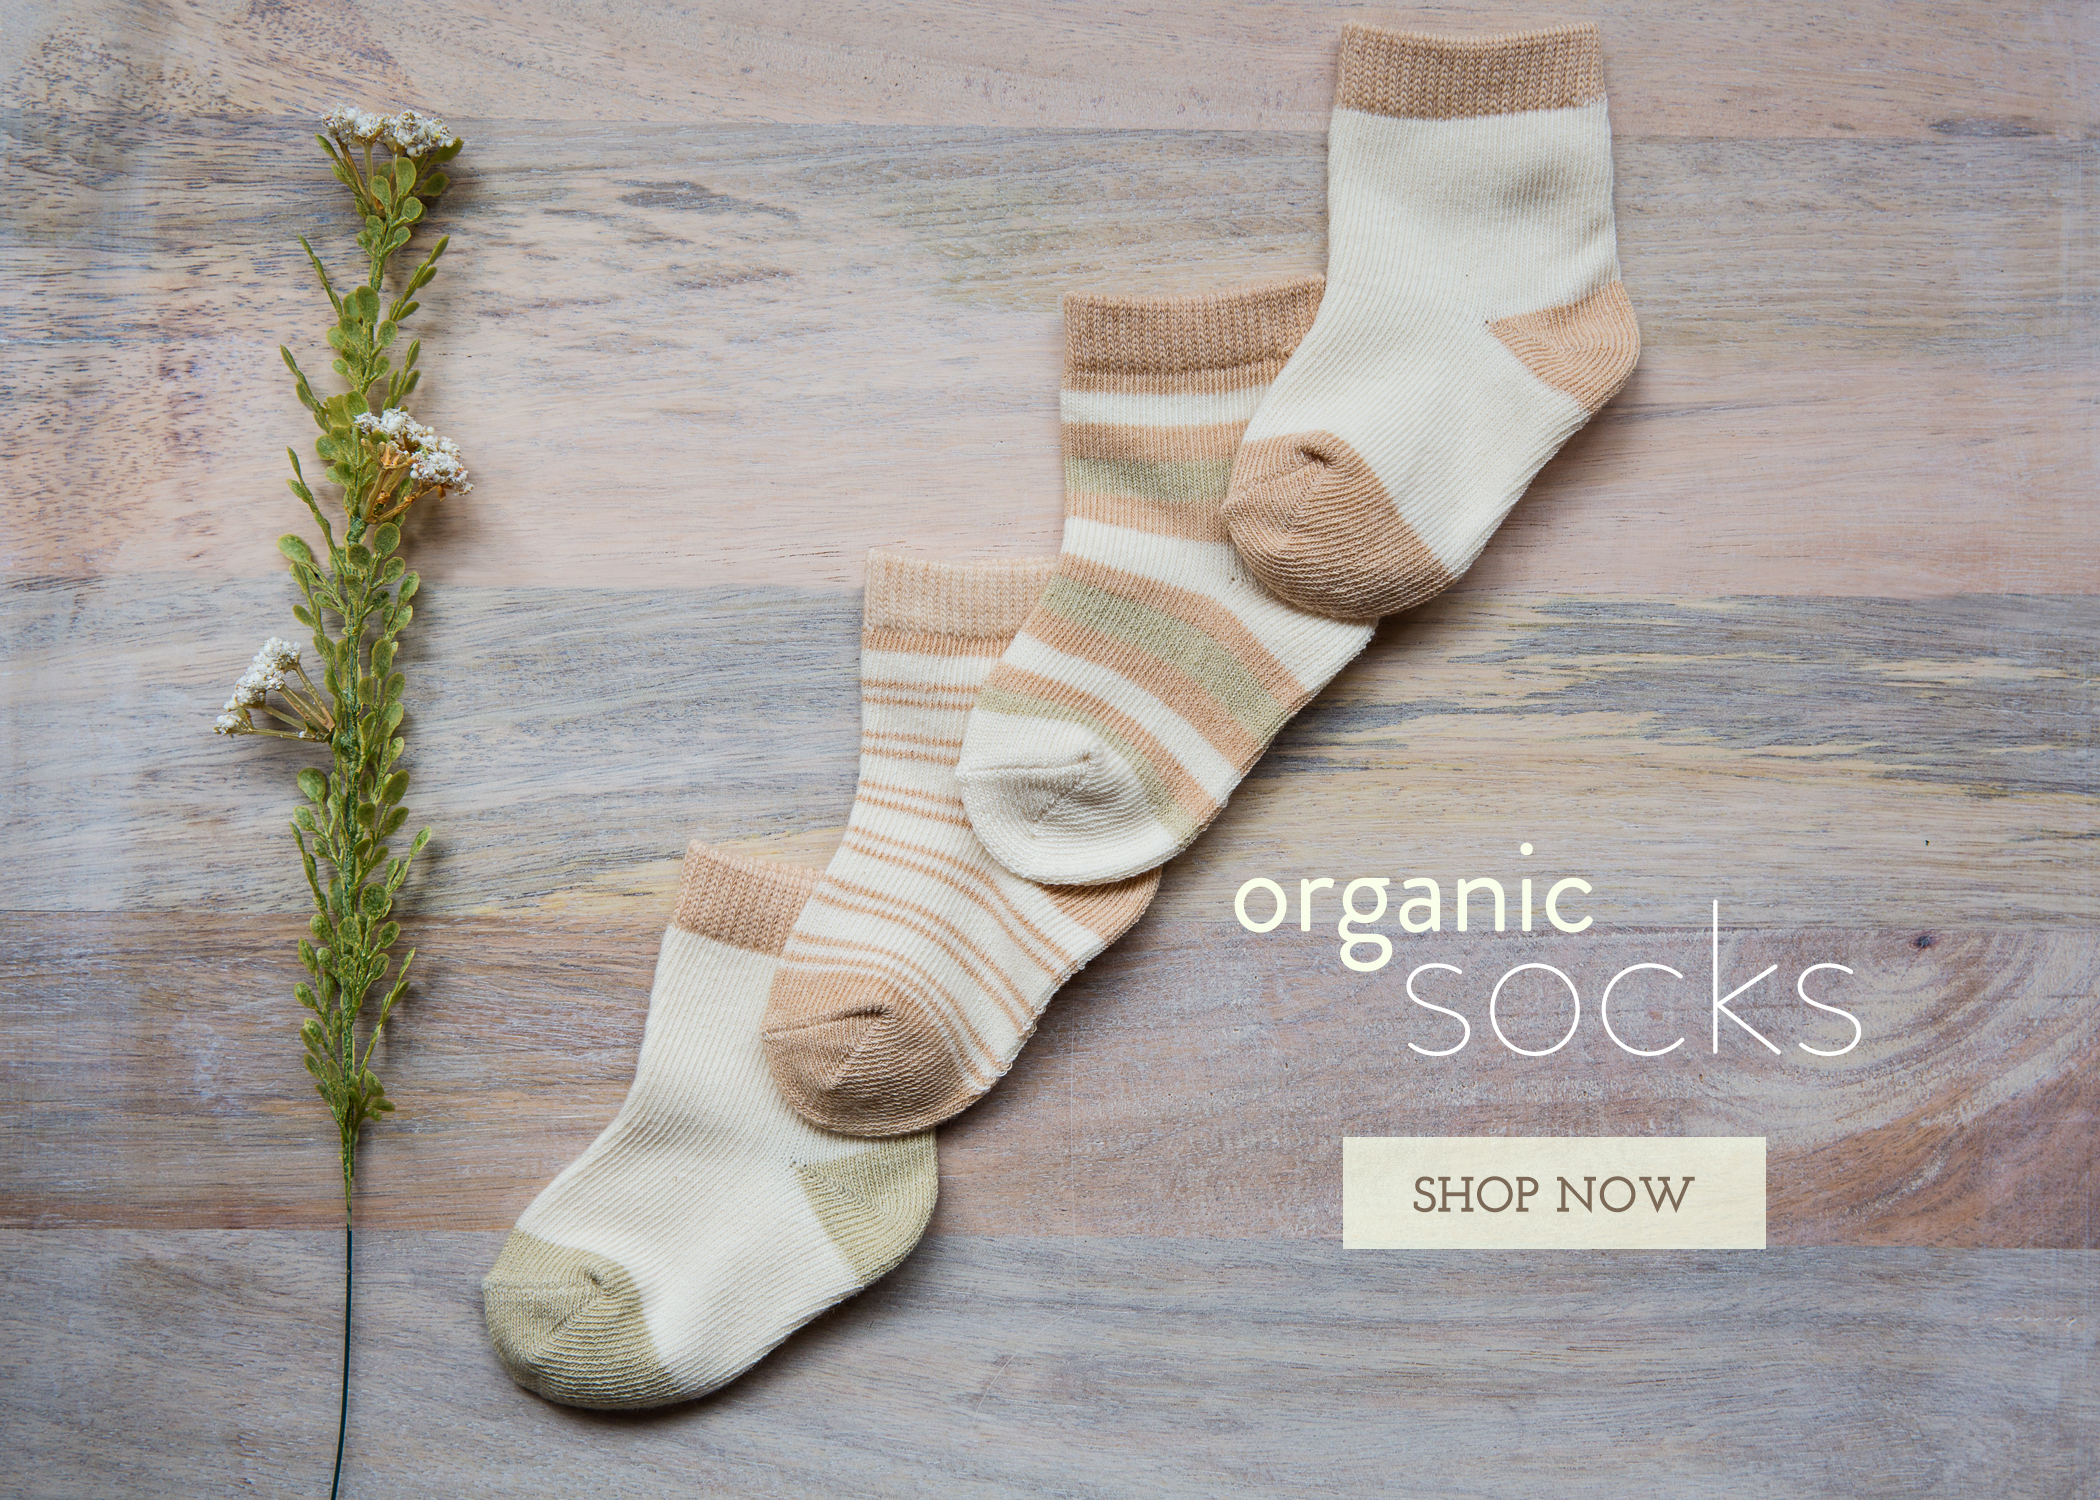 organic-socks.jpg